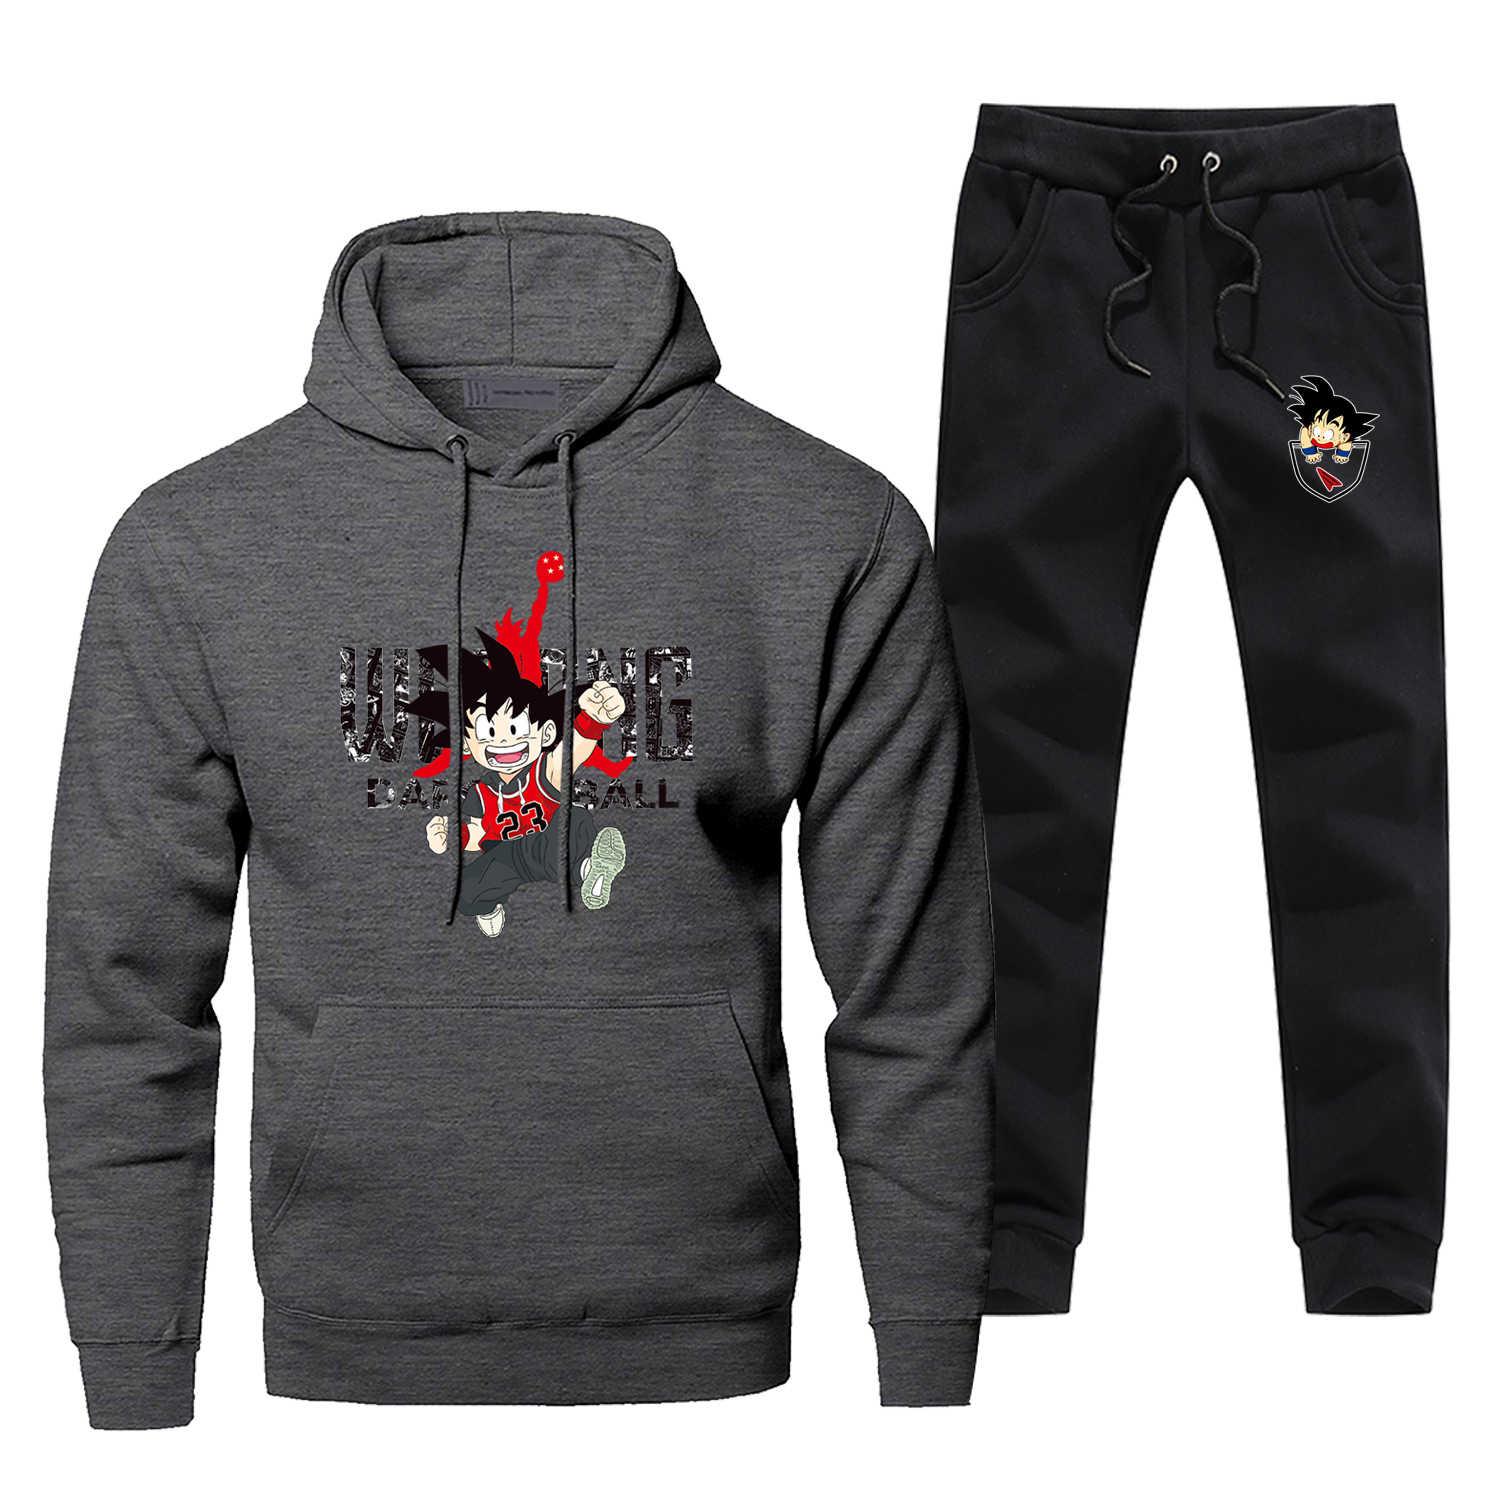 Dragon Ball Hoodies Sweatshirts Japan Anime Harajuku Mode herren Kleidung Lässig Fleece männer Hip Hop Jogging Hosen Sweatshirt